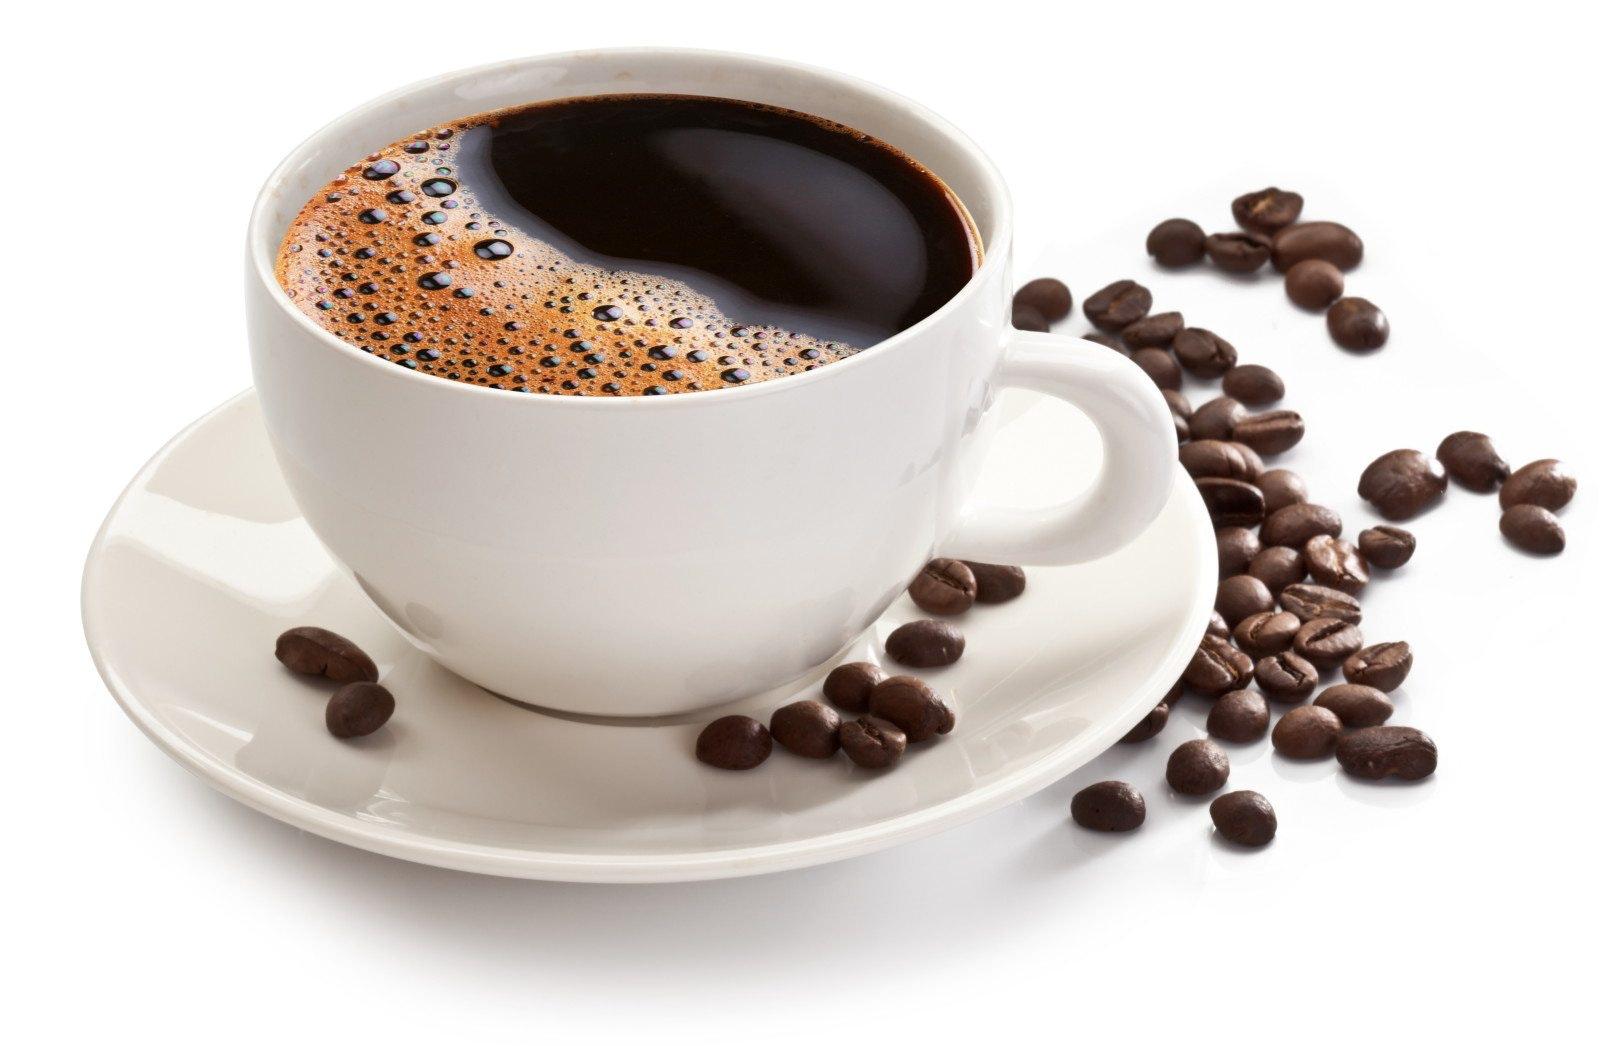 tål inte kaffe